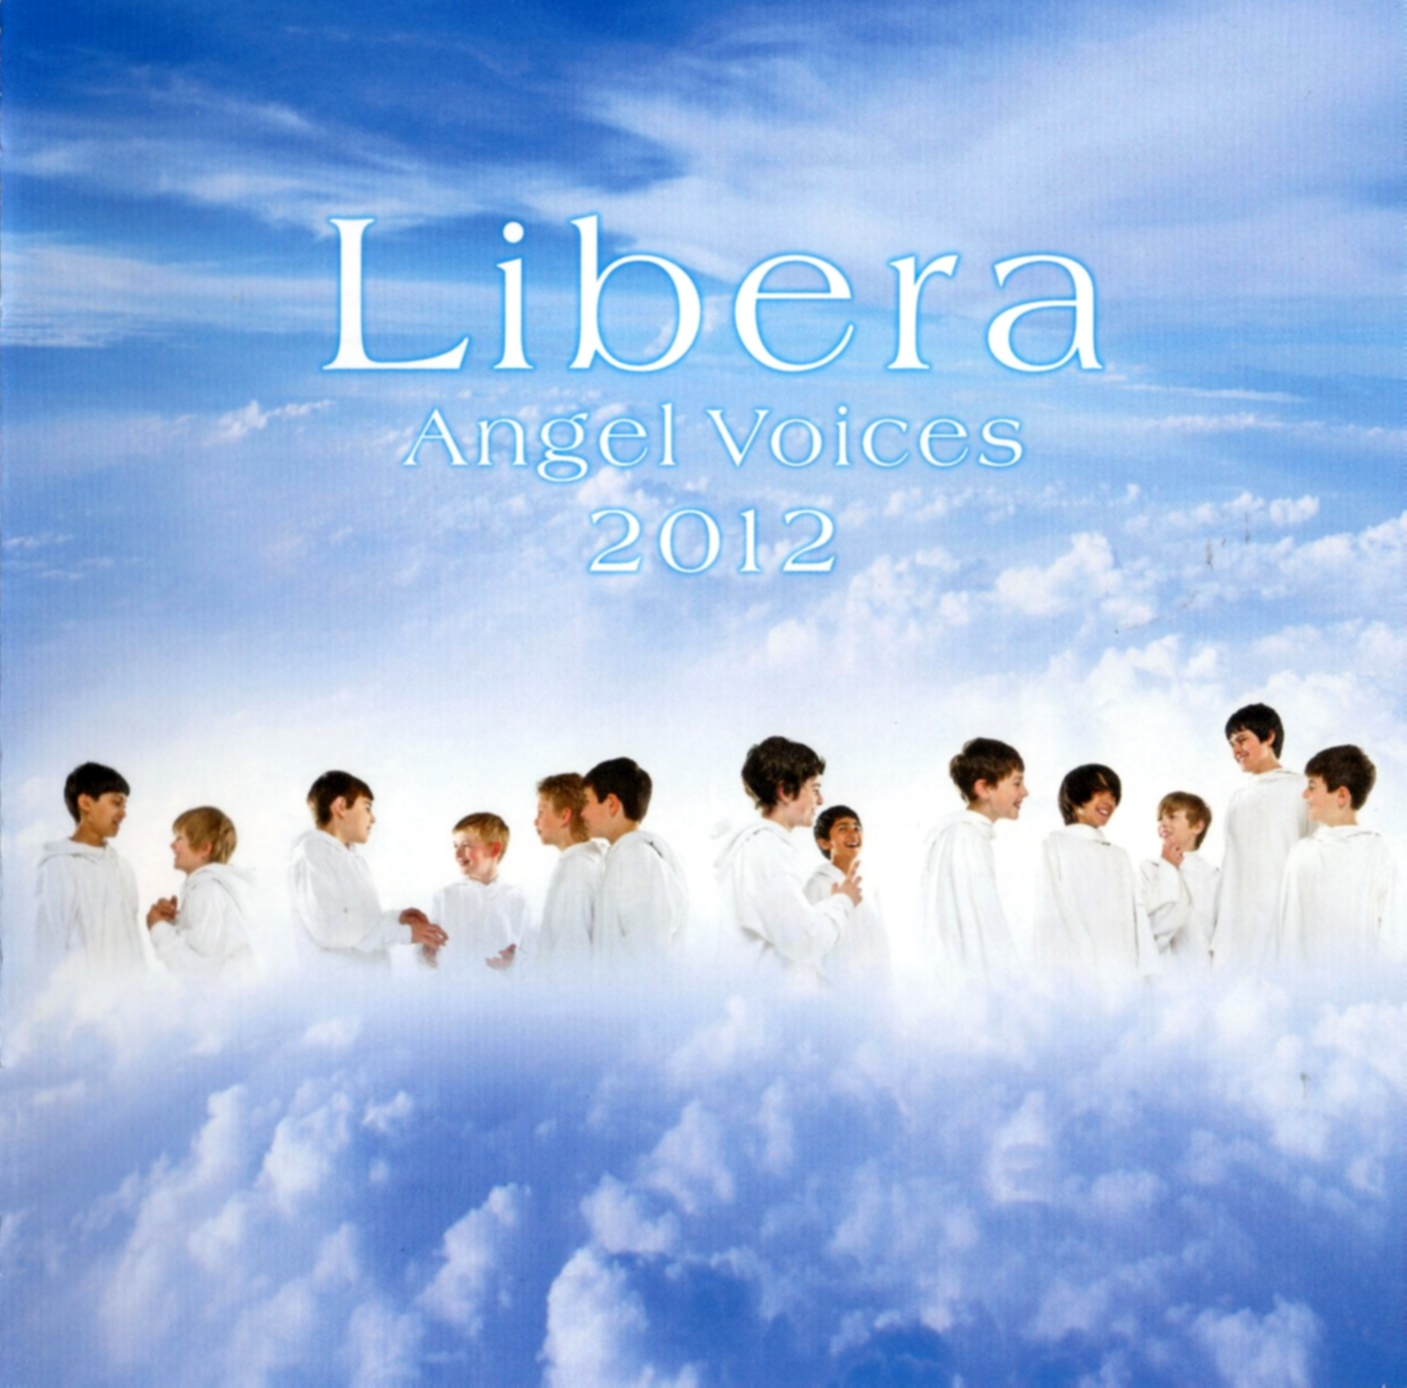 La discographie Libera 428823Couvlarge